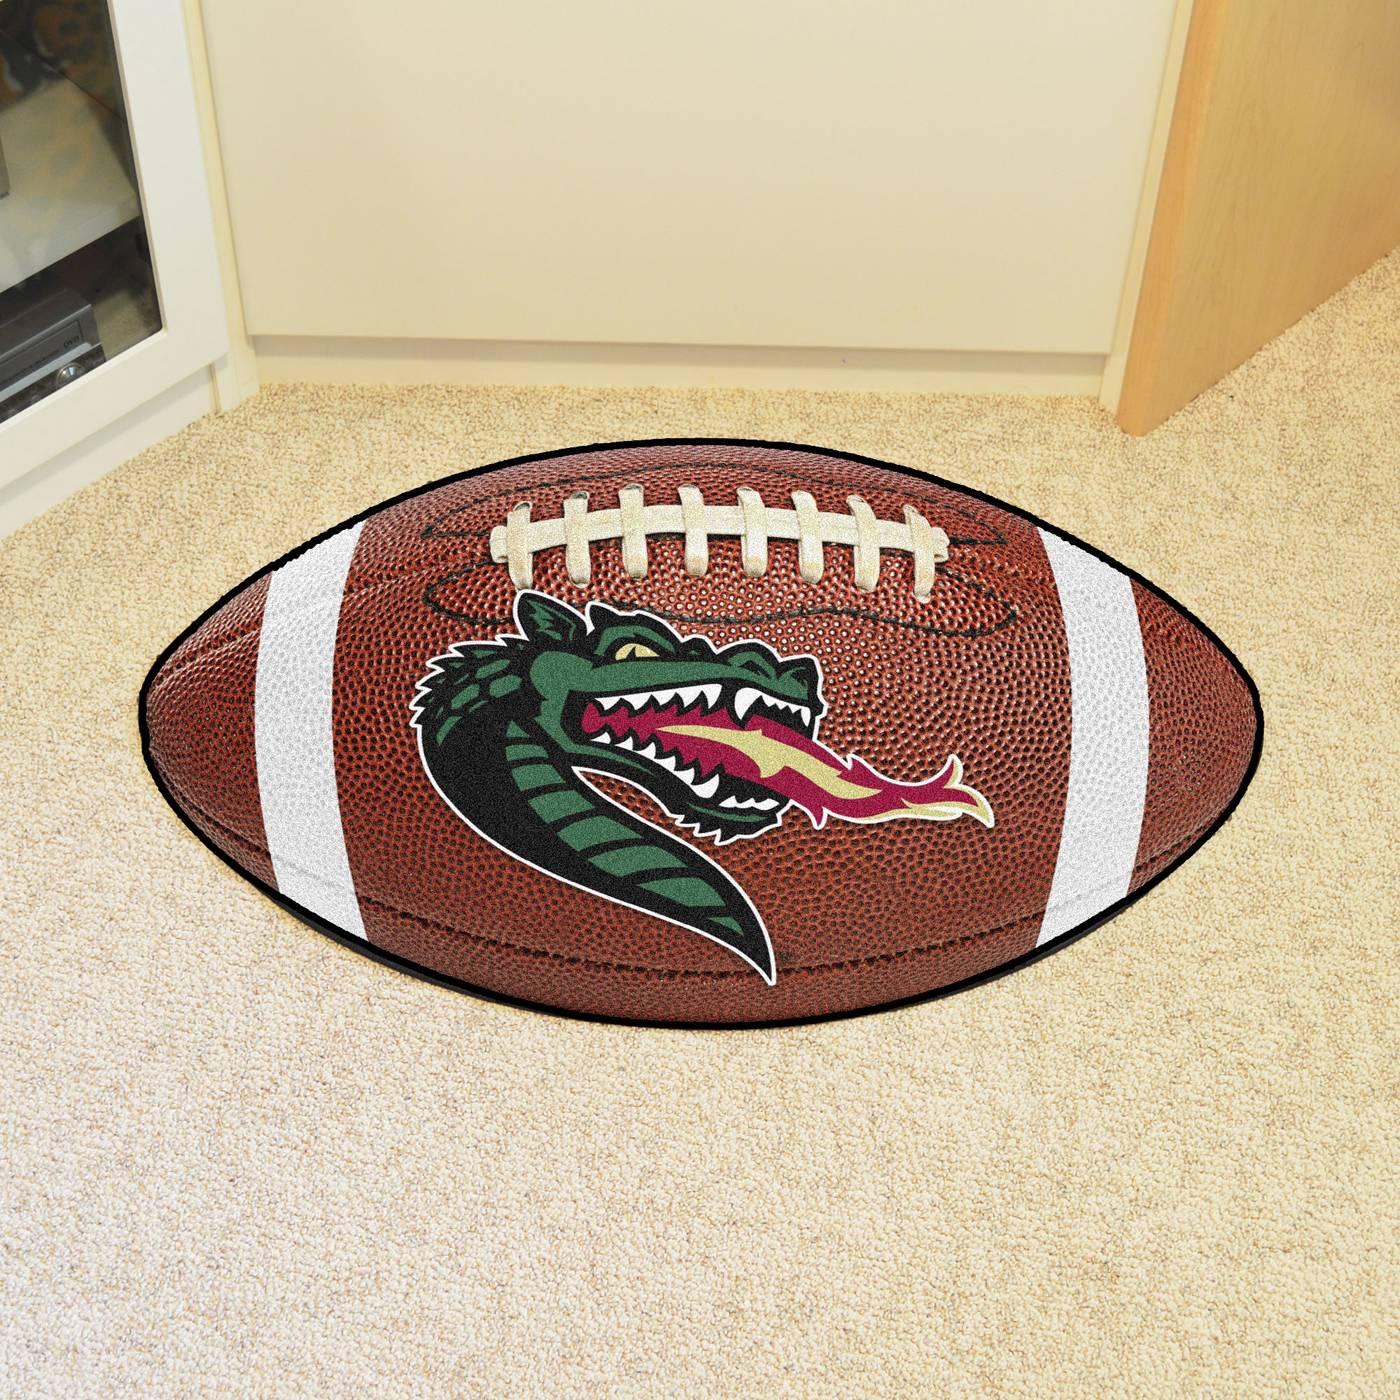 Uab Blazers Football Floor Mat